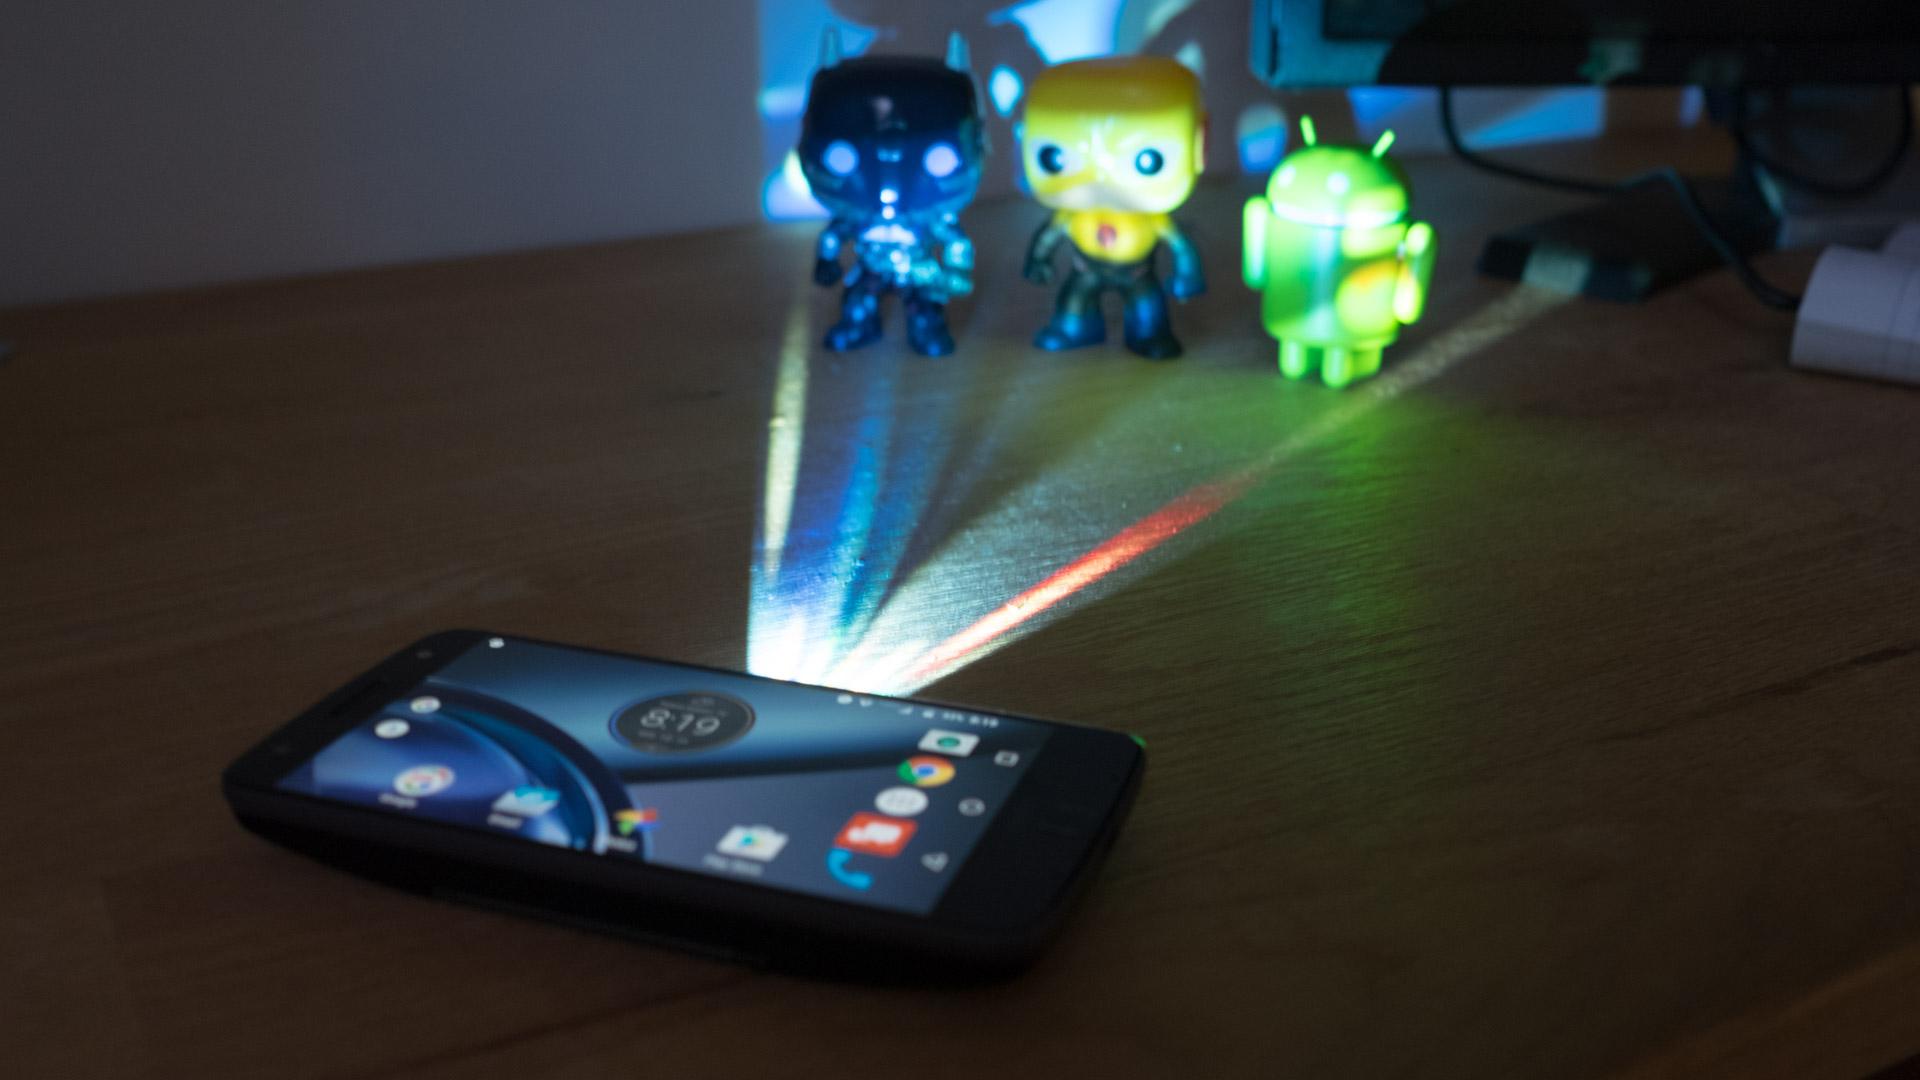 Moto Z review